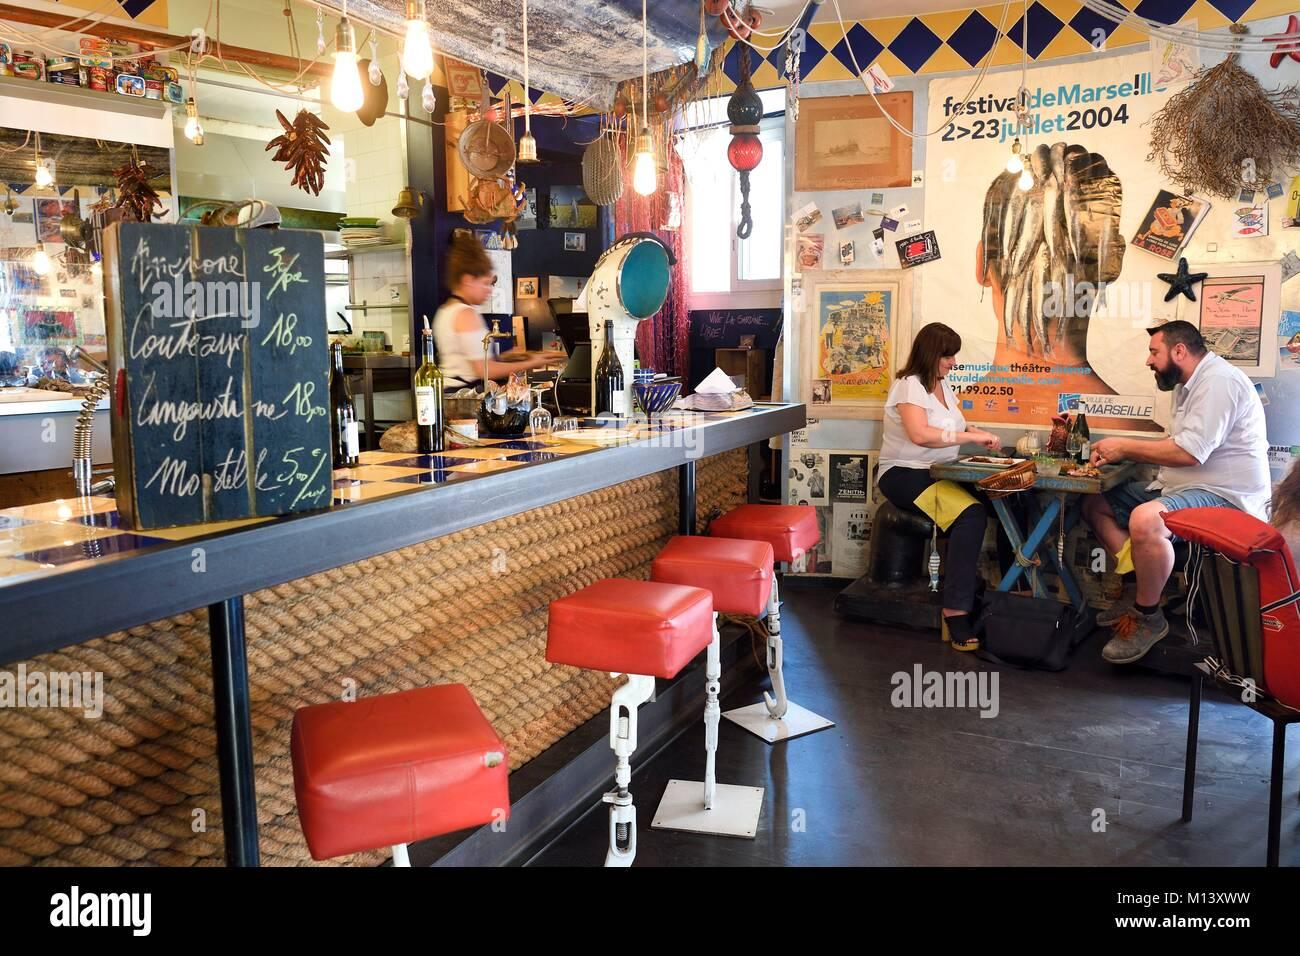 provence alpes cote d 39 azur restaurant stock photos provence alpes cote d 39 azur restaurant stock. Black Bedroom Furniture Sets. Home Design Ideas